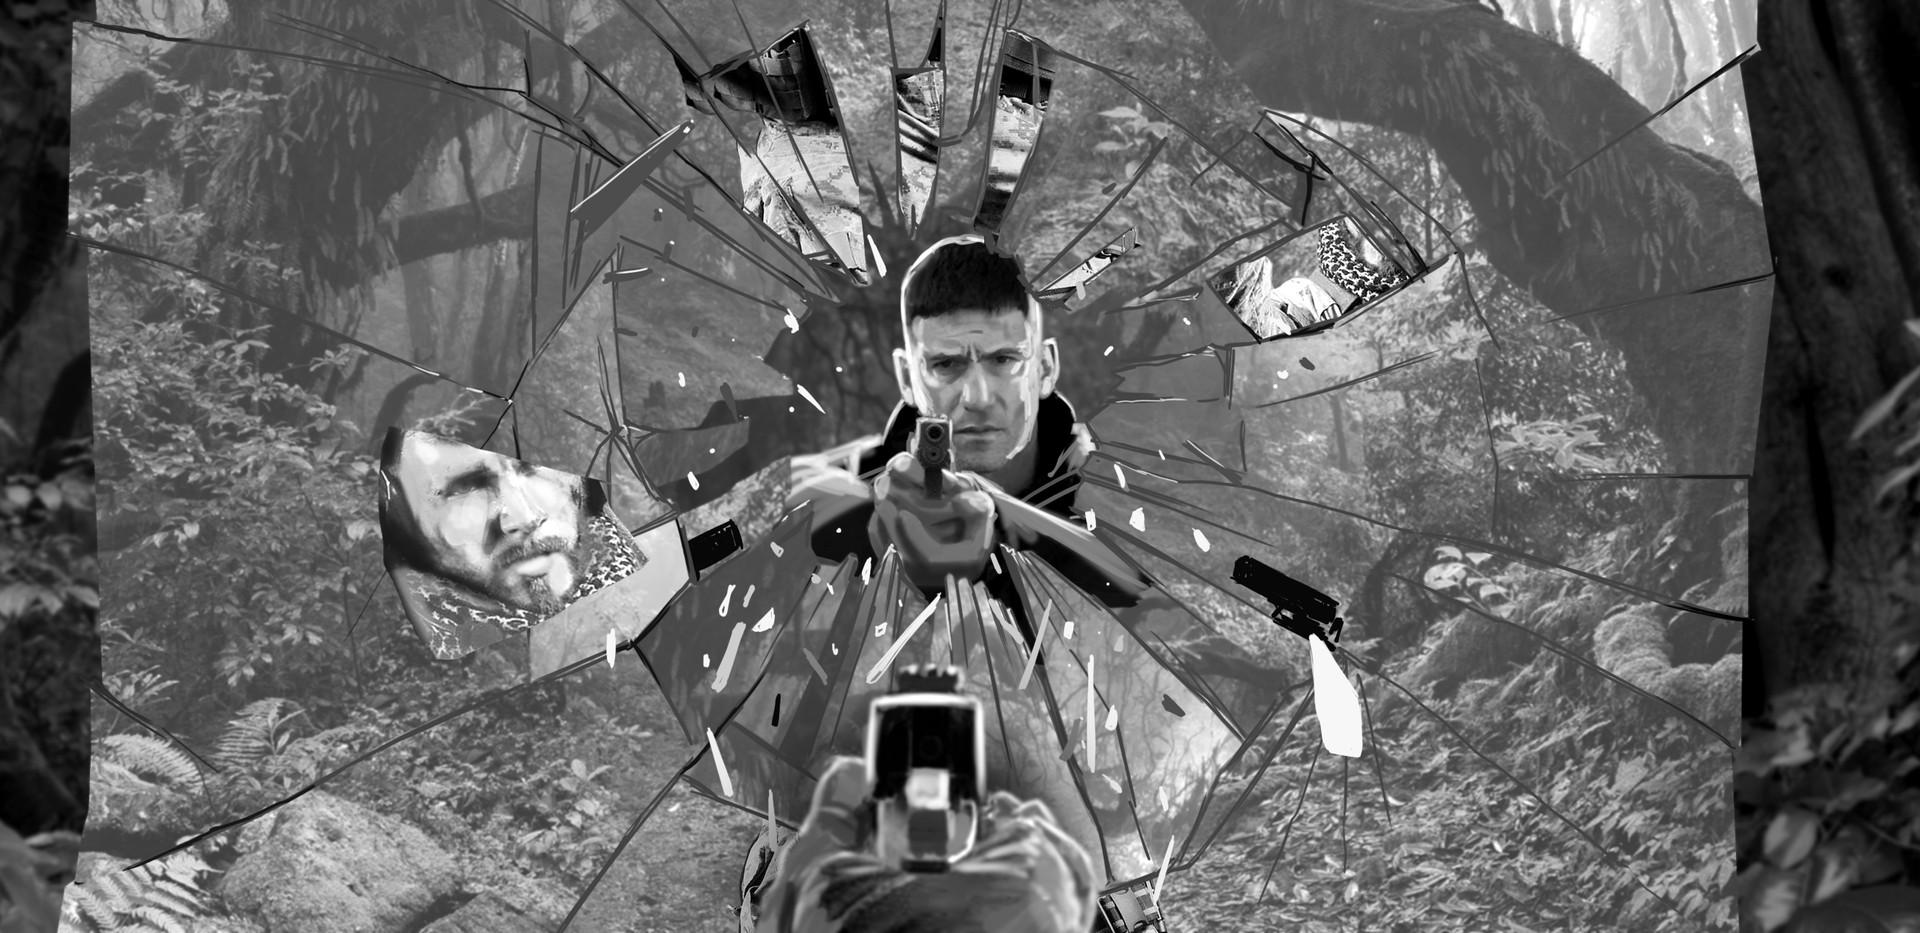 Mirrors_003_20190115.jpg